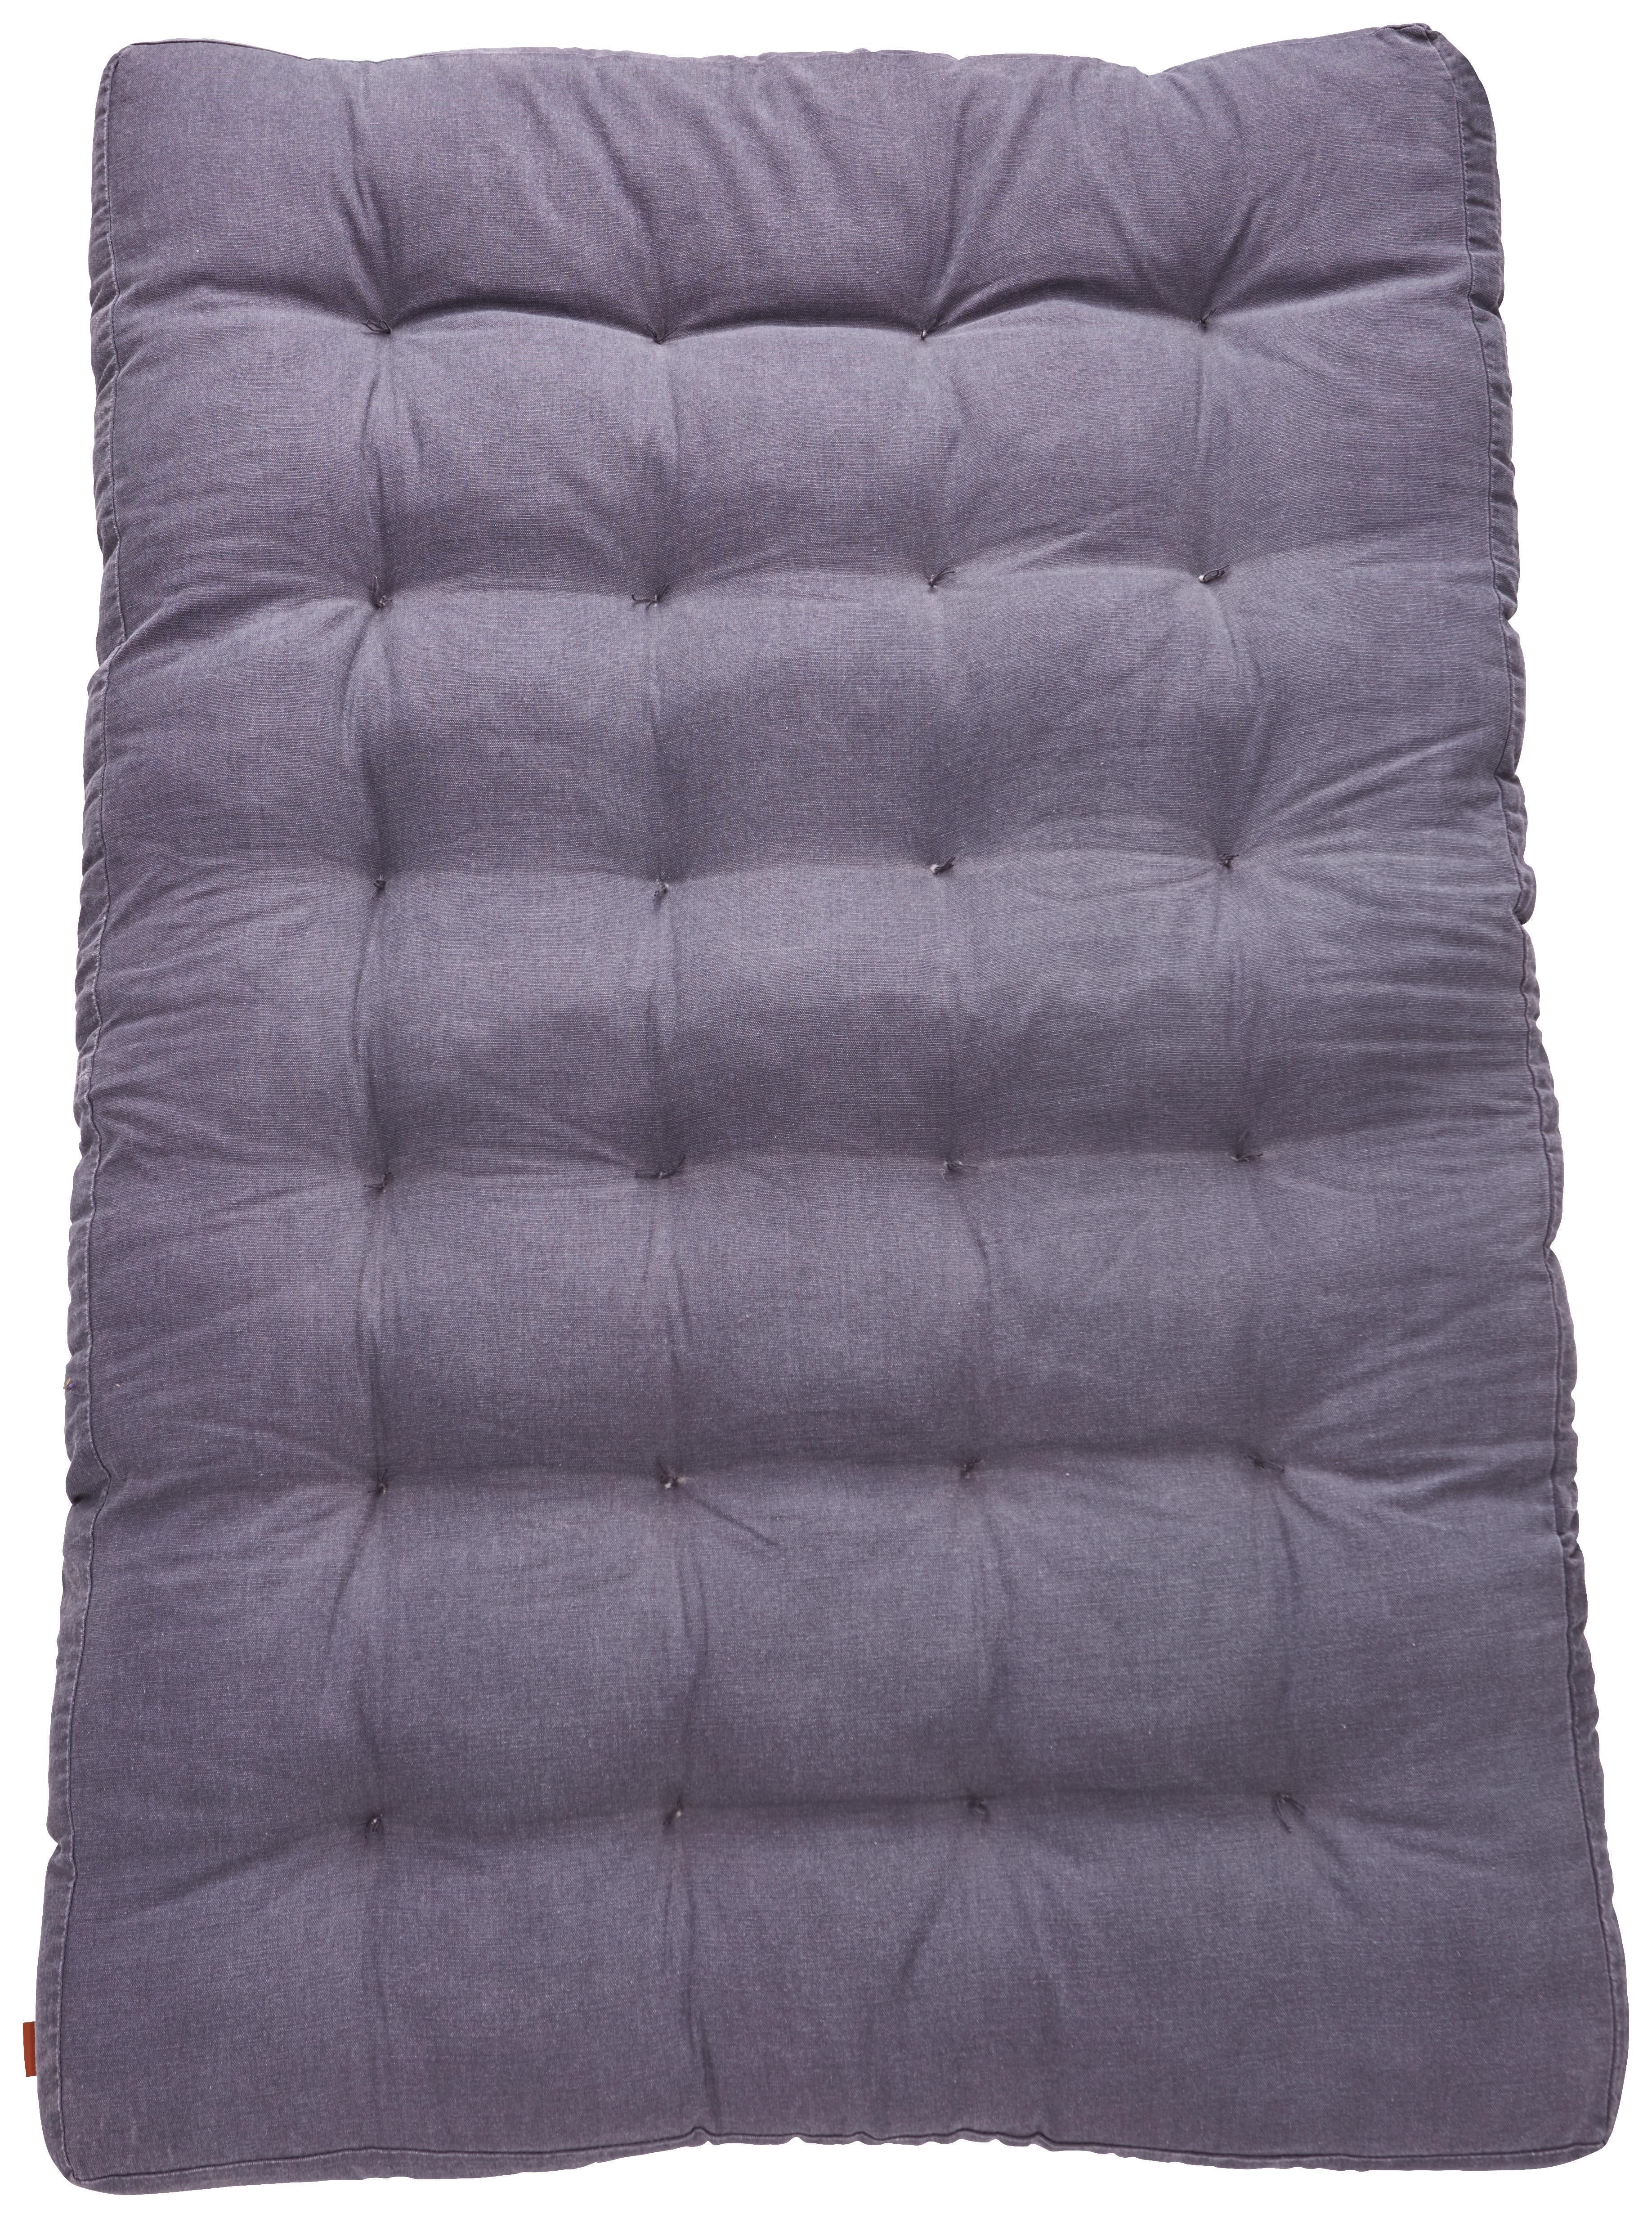 Gartensitzkissen Grau   Grau, Textil (120/80/7cm)   Premium Living